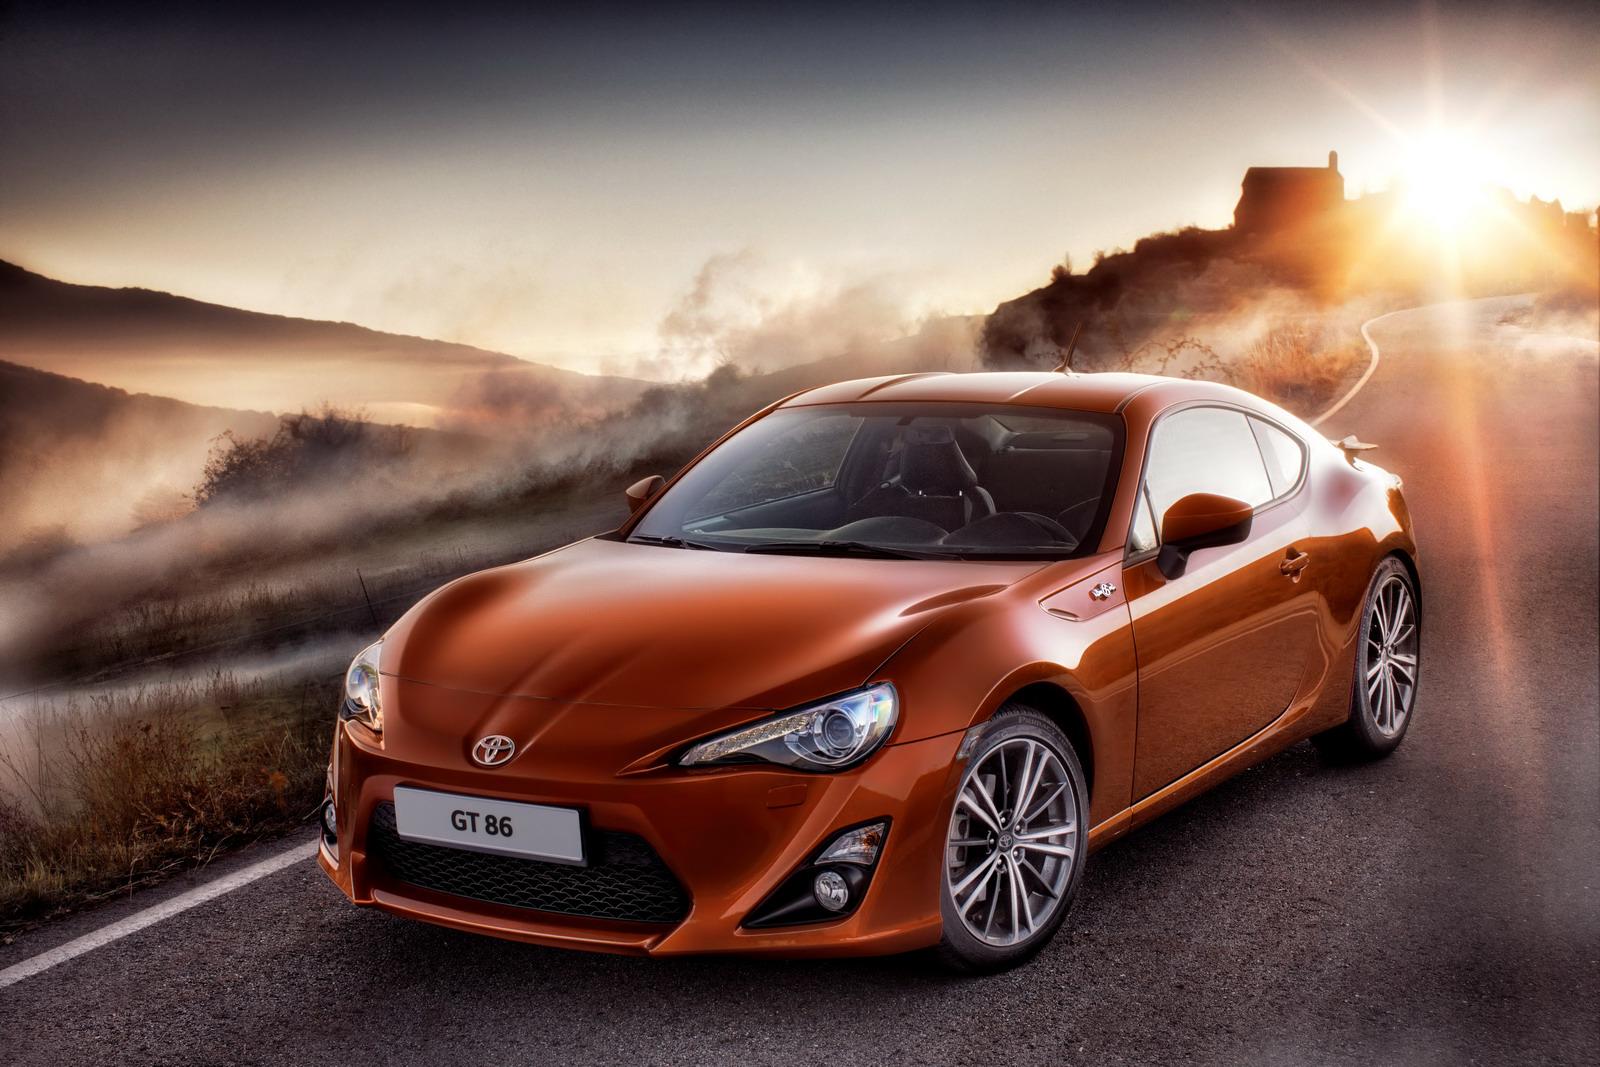 Second Generation Toyota Gt Scion Fr S Confirmed